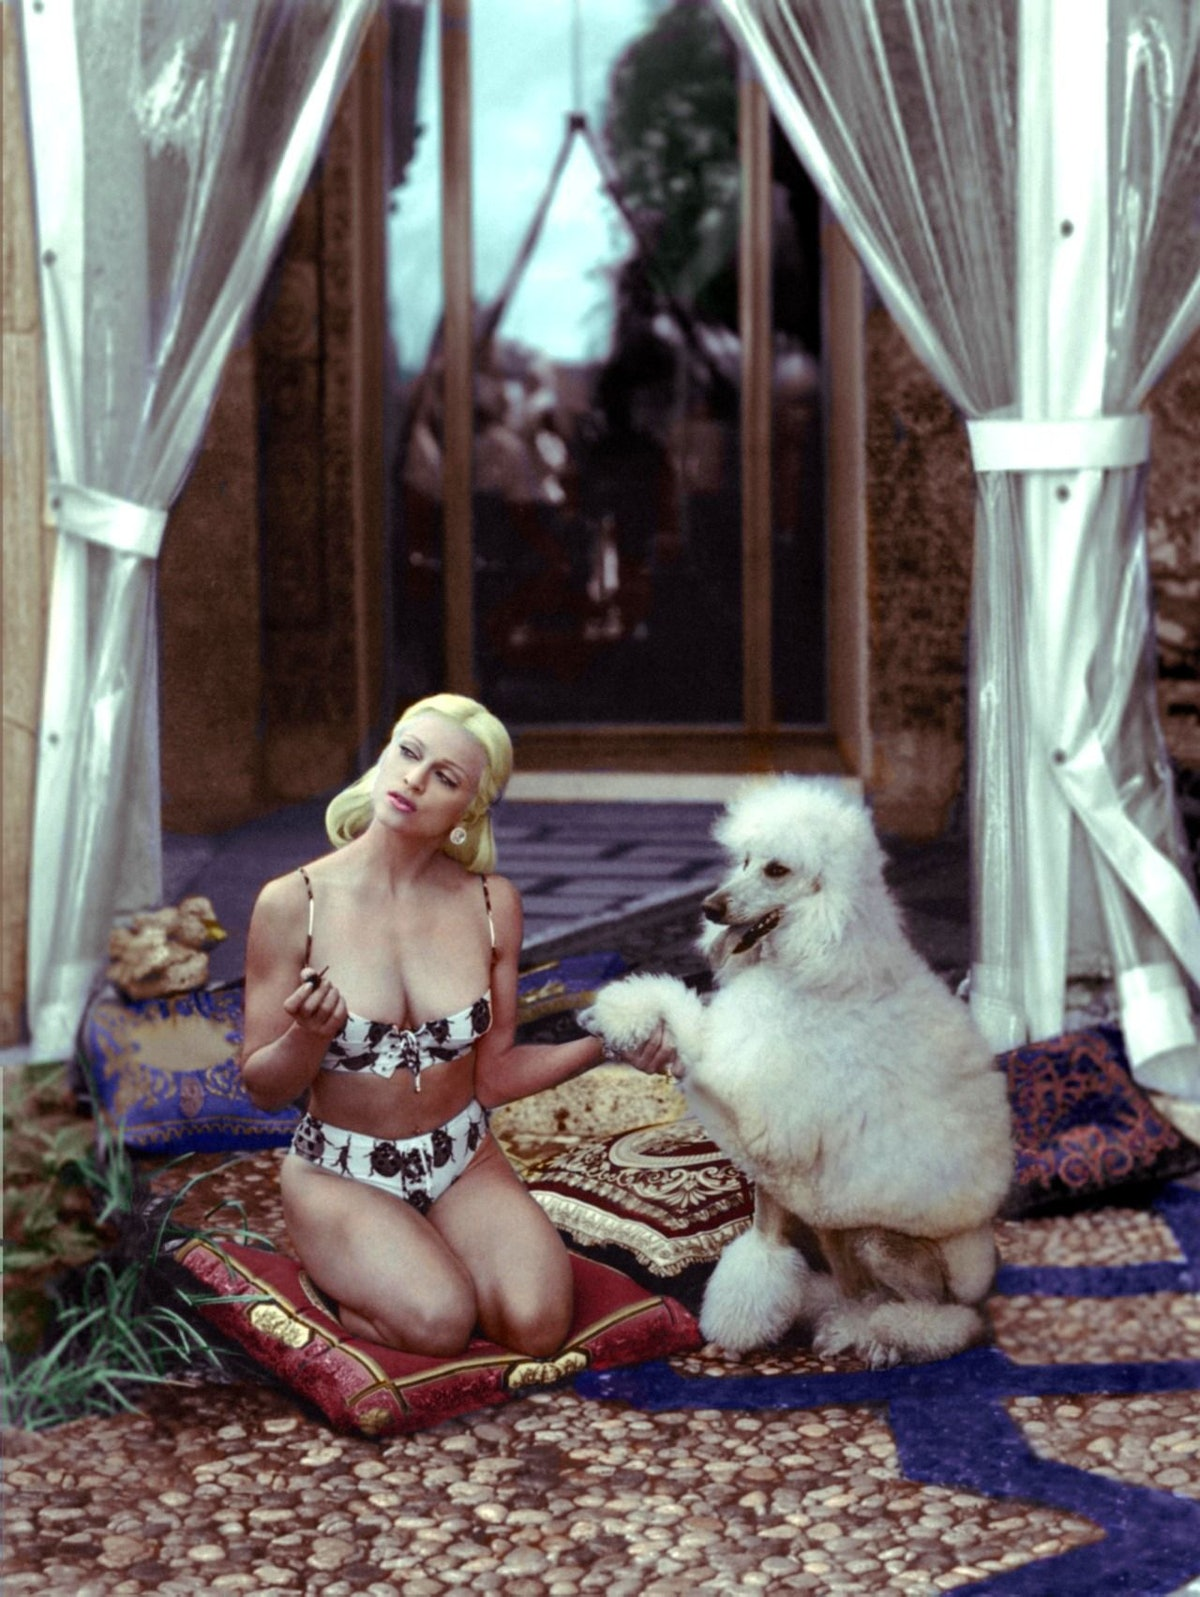 madonna-versace-campaign-steven-meisel.jpg